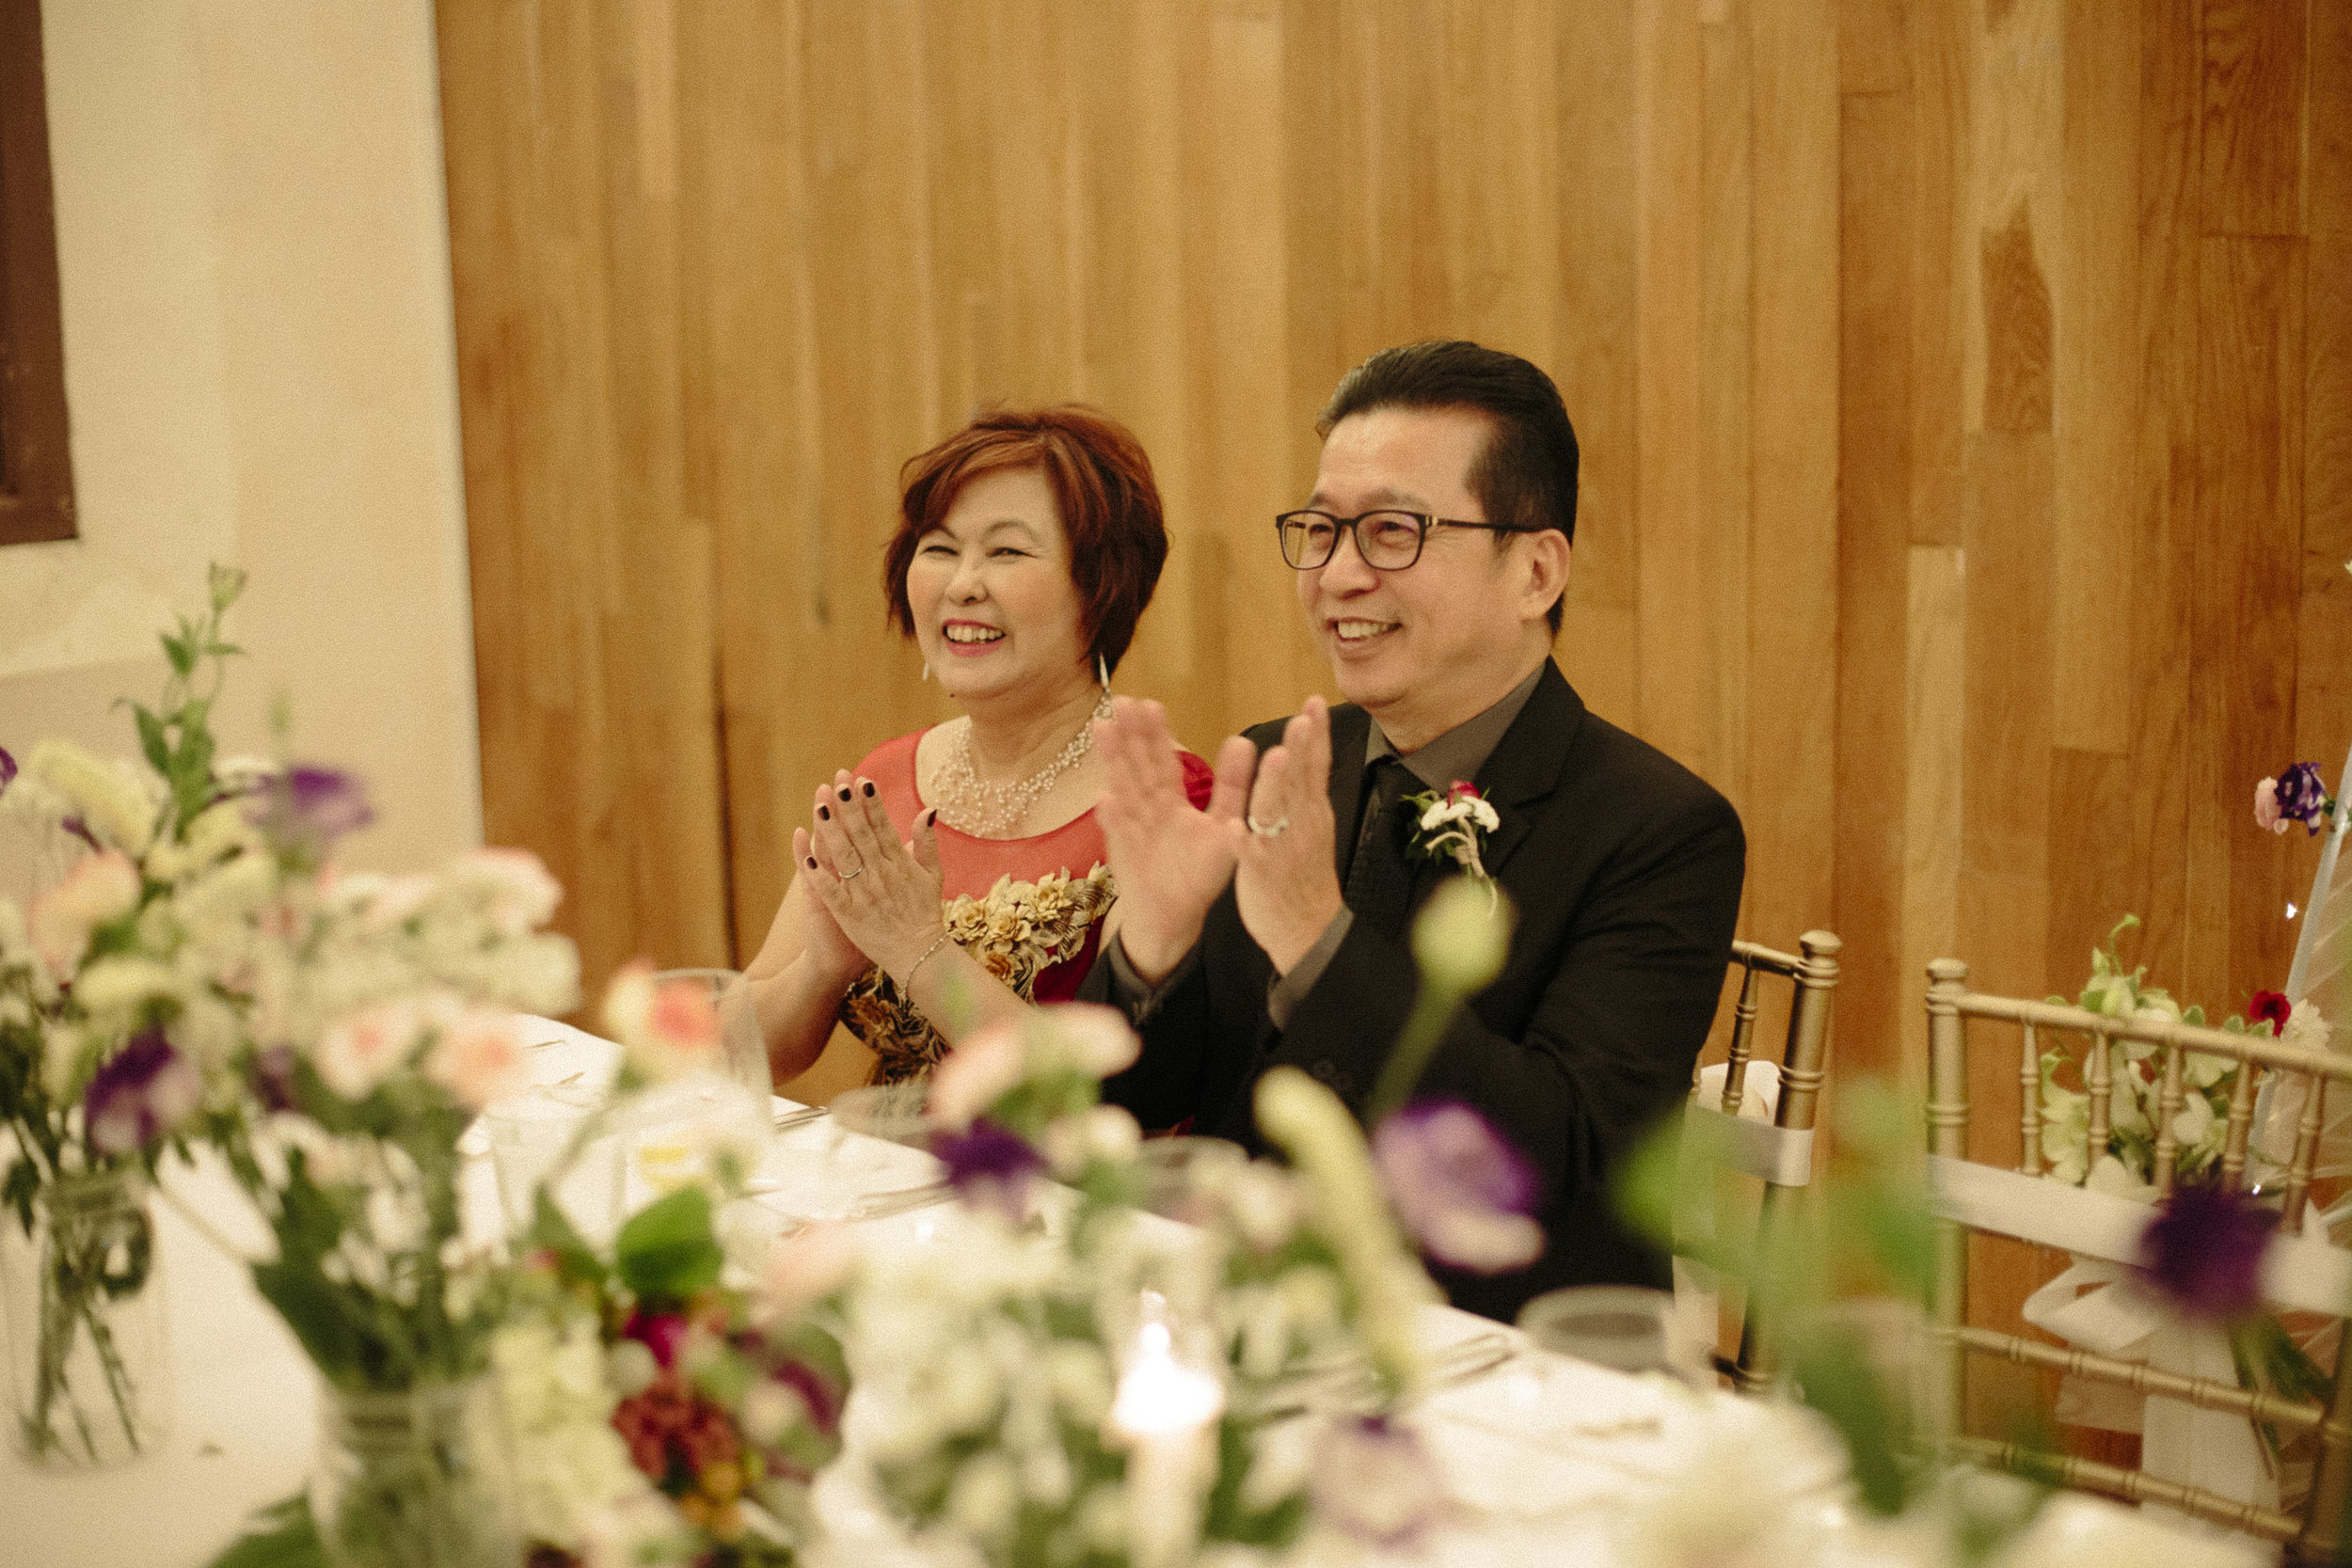 singapore-wedding-photographer-hiram-joyce-057.jpg